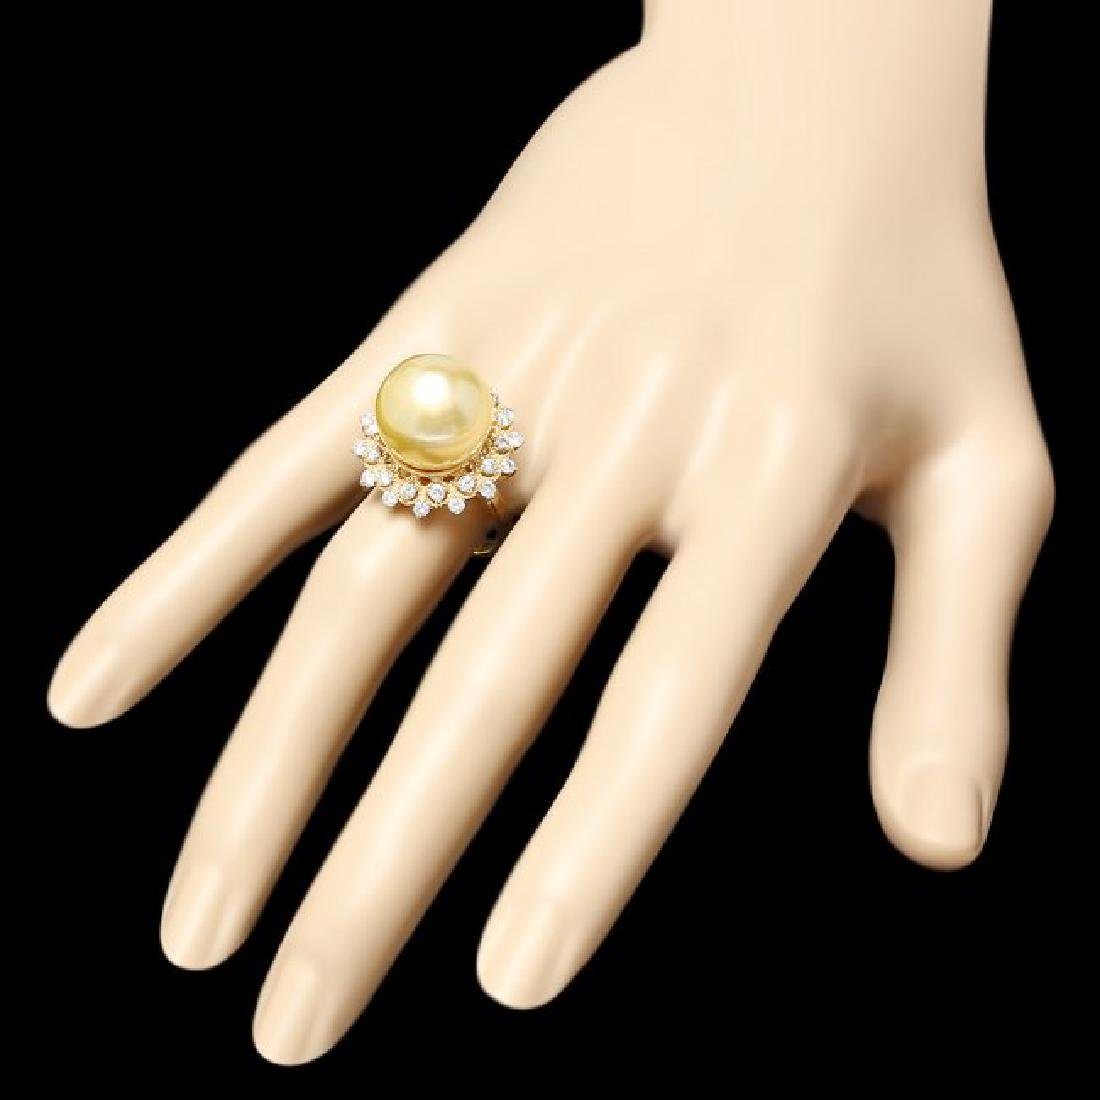 14k Gold 14 X 14mm Pearl 0.90ct Diamond Ring - 3